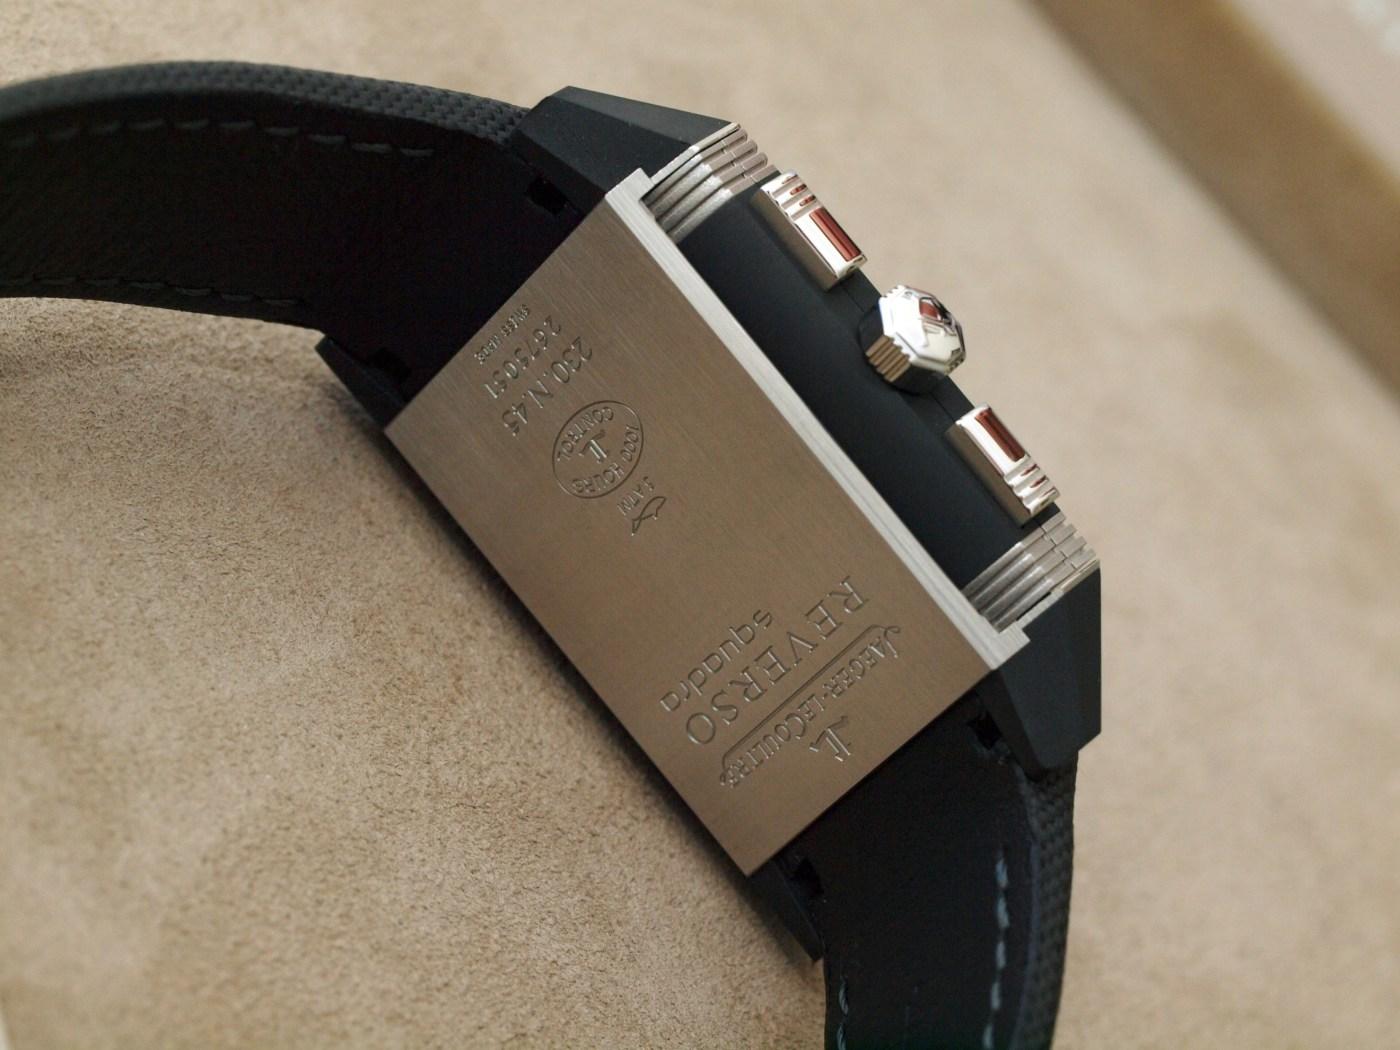 Jaeger-LeCoultre Reverso Squadra Chronograph GMT Palermo Open caseback